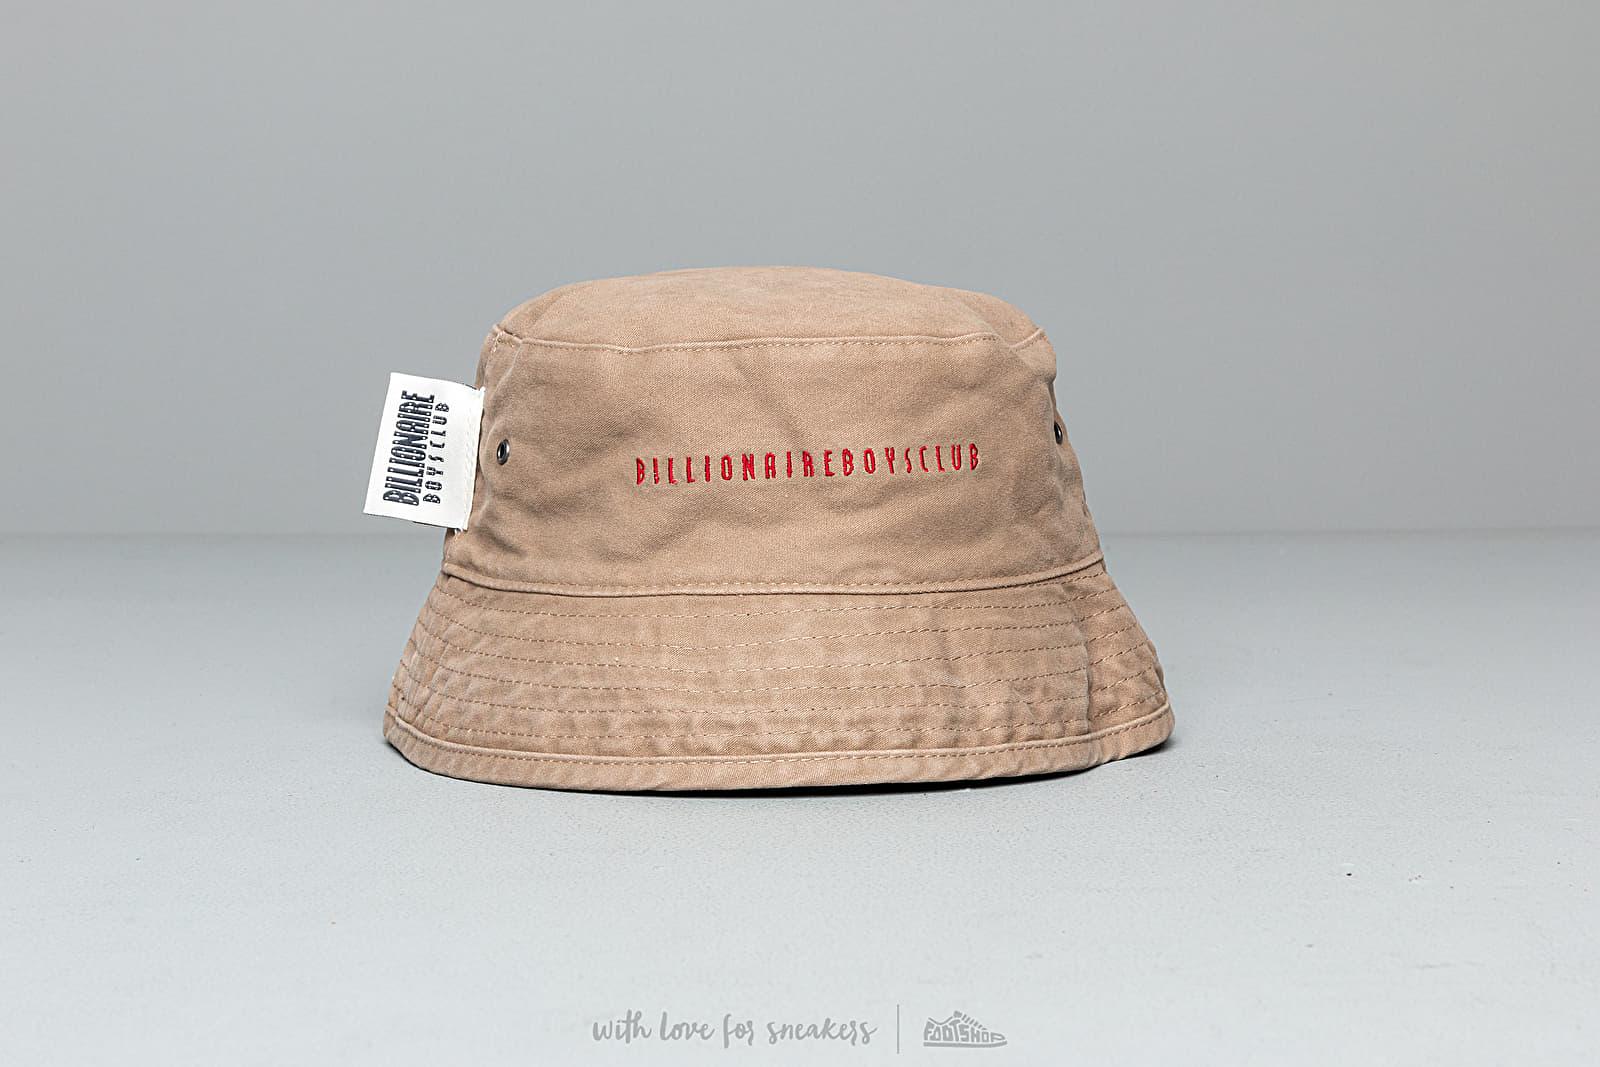 Billionaire Boys Club Reversible Bucket Hat